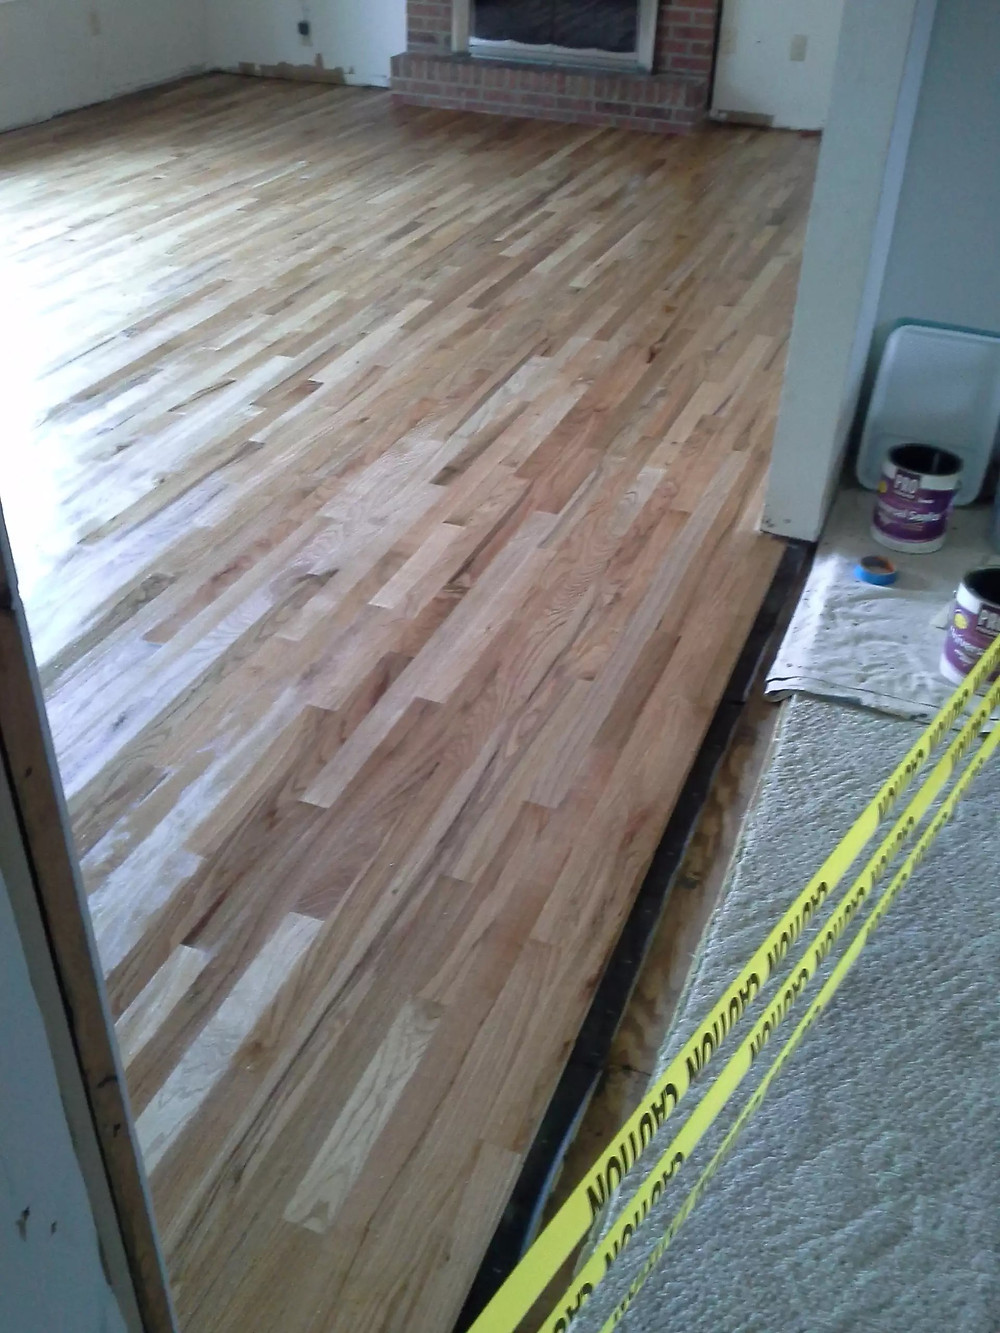 My oak floors with 1st coat of Universal Sealer applied